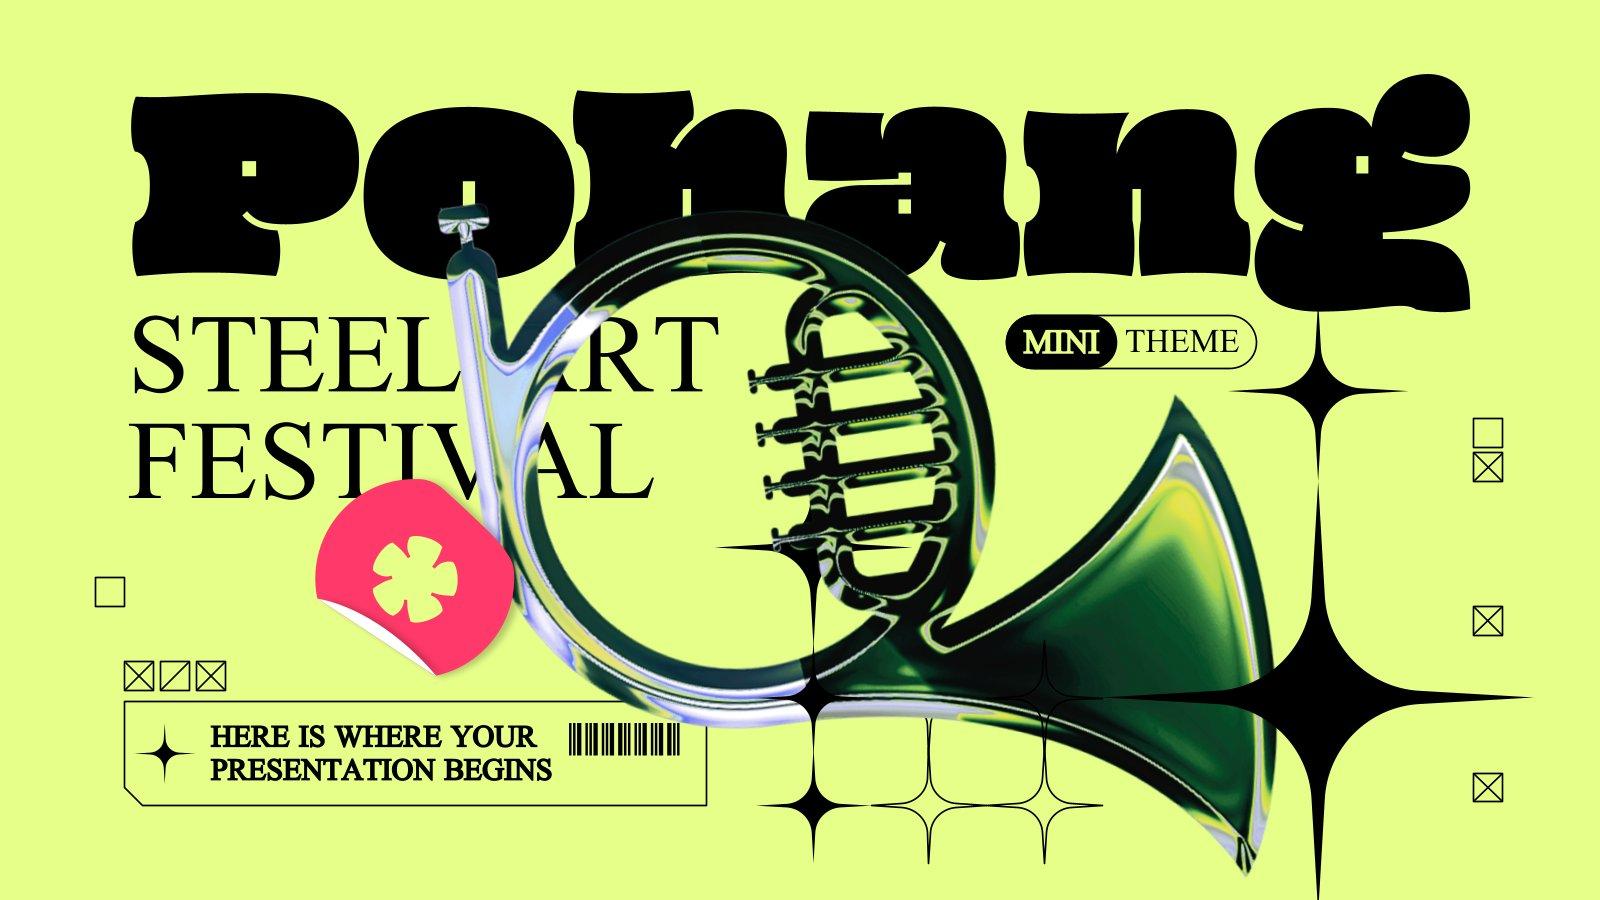 Pohang Steel Art Festival Minithema Präsentationsvorlage